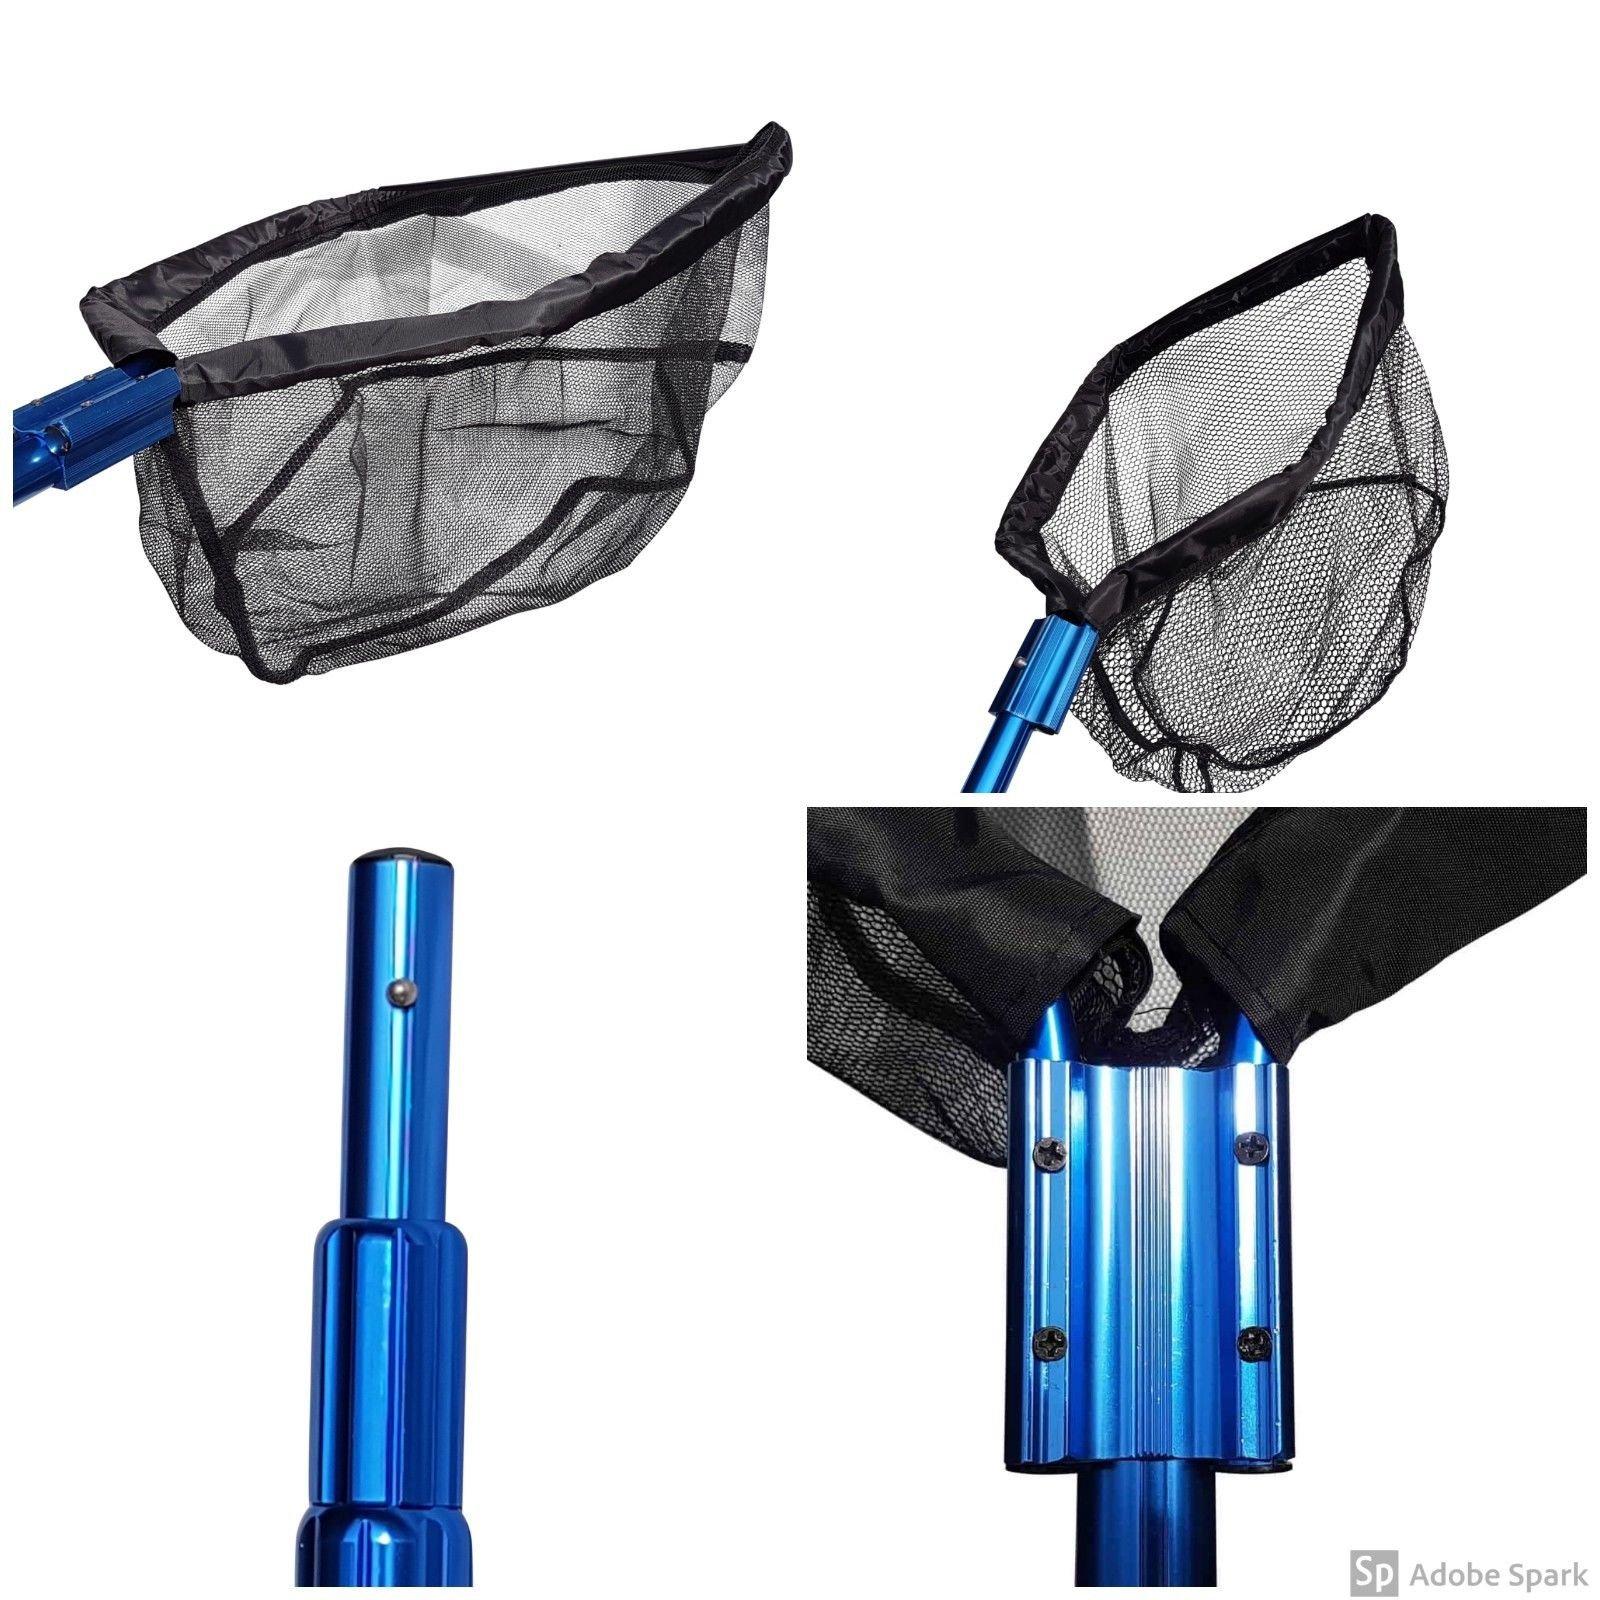 Heavy Duty Koi Pond Net Combo Pack, Includes Catching Net, Skimmer Net & HD Pole